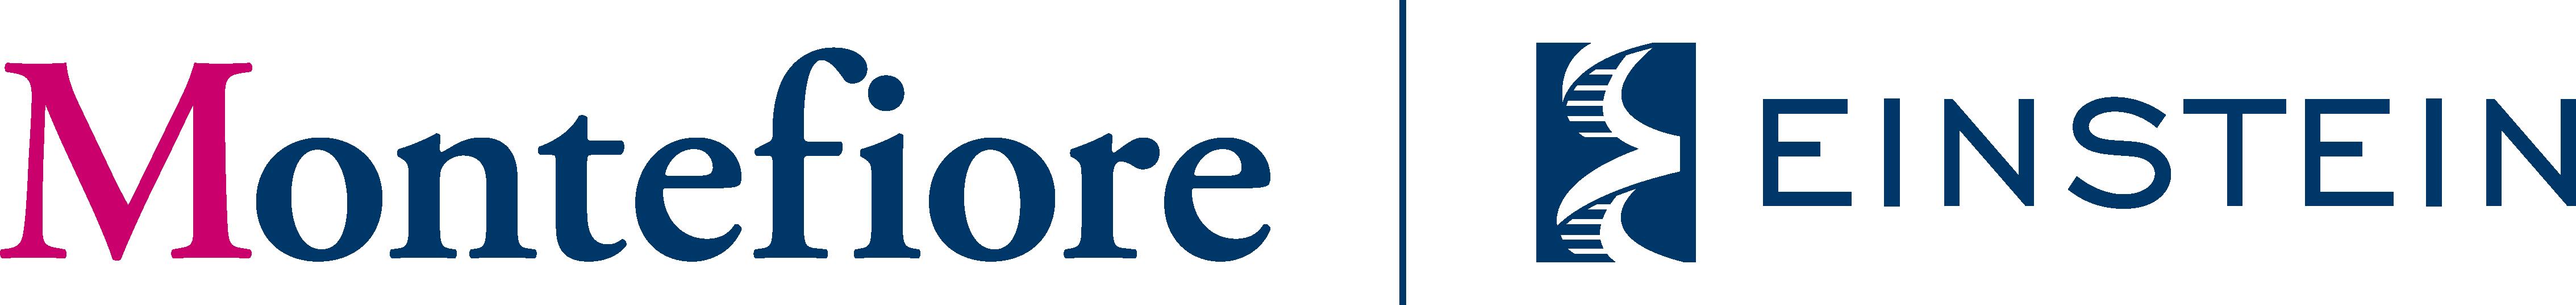 Montefiore Health System logo